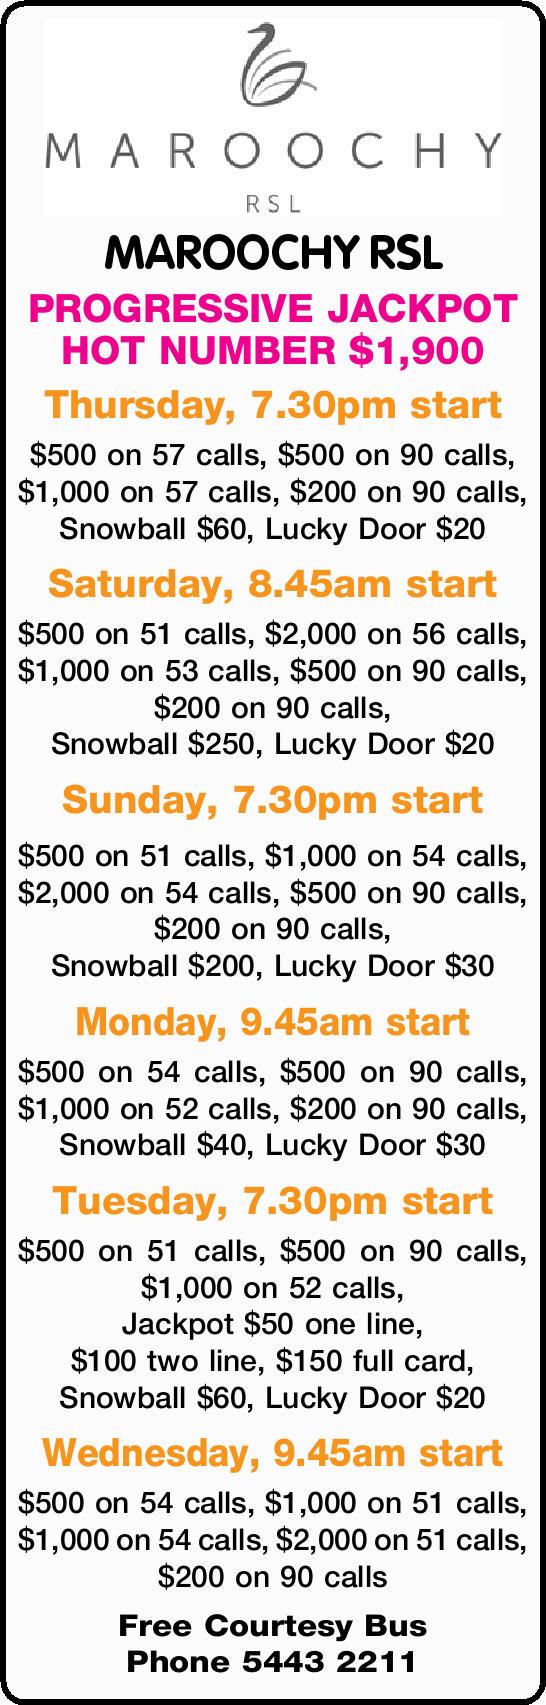 MAROOCHY RSL PROGRESSIVE JACKPOT HOT NUMBER $1,900 Thursday, 7.30pm start $500 on 57 calls, $500...